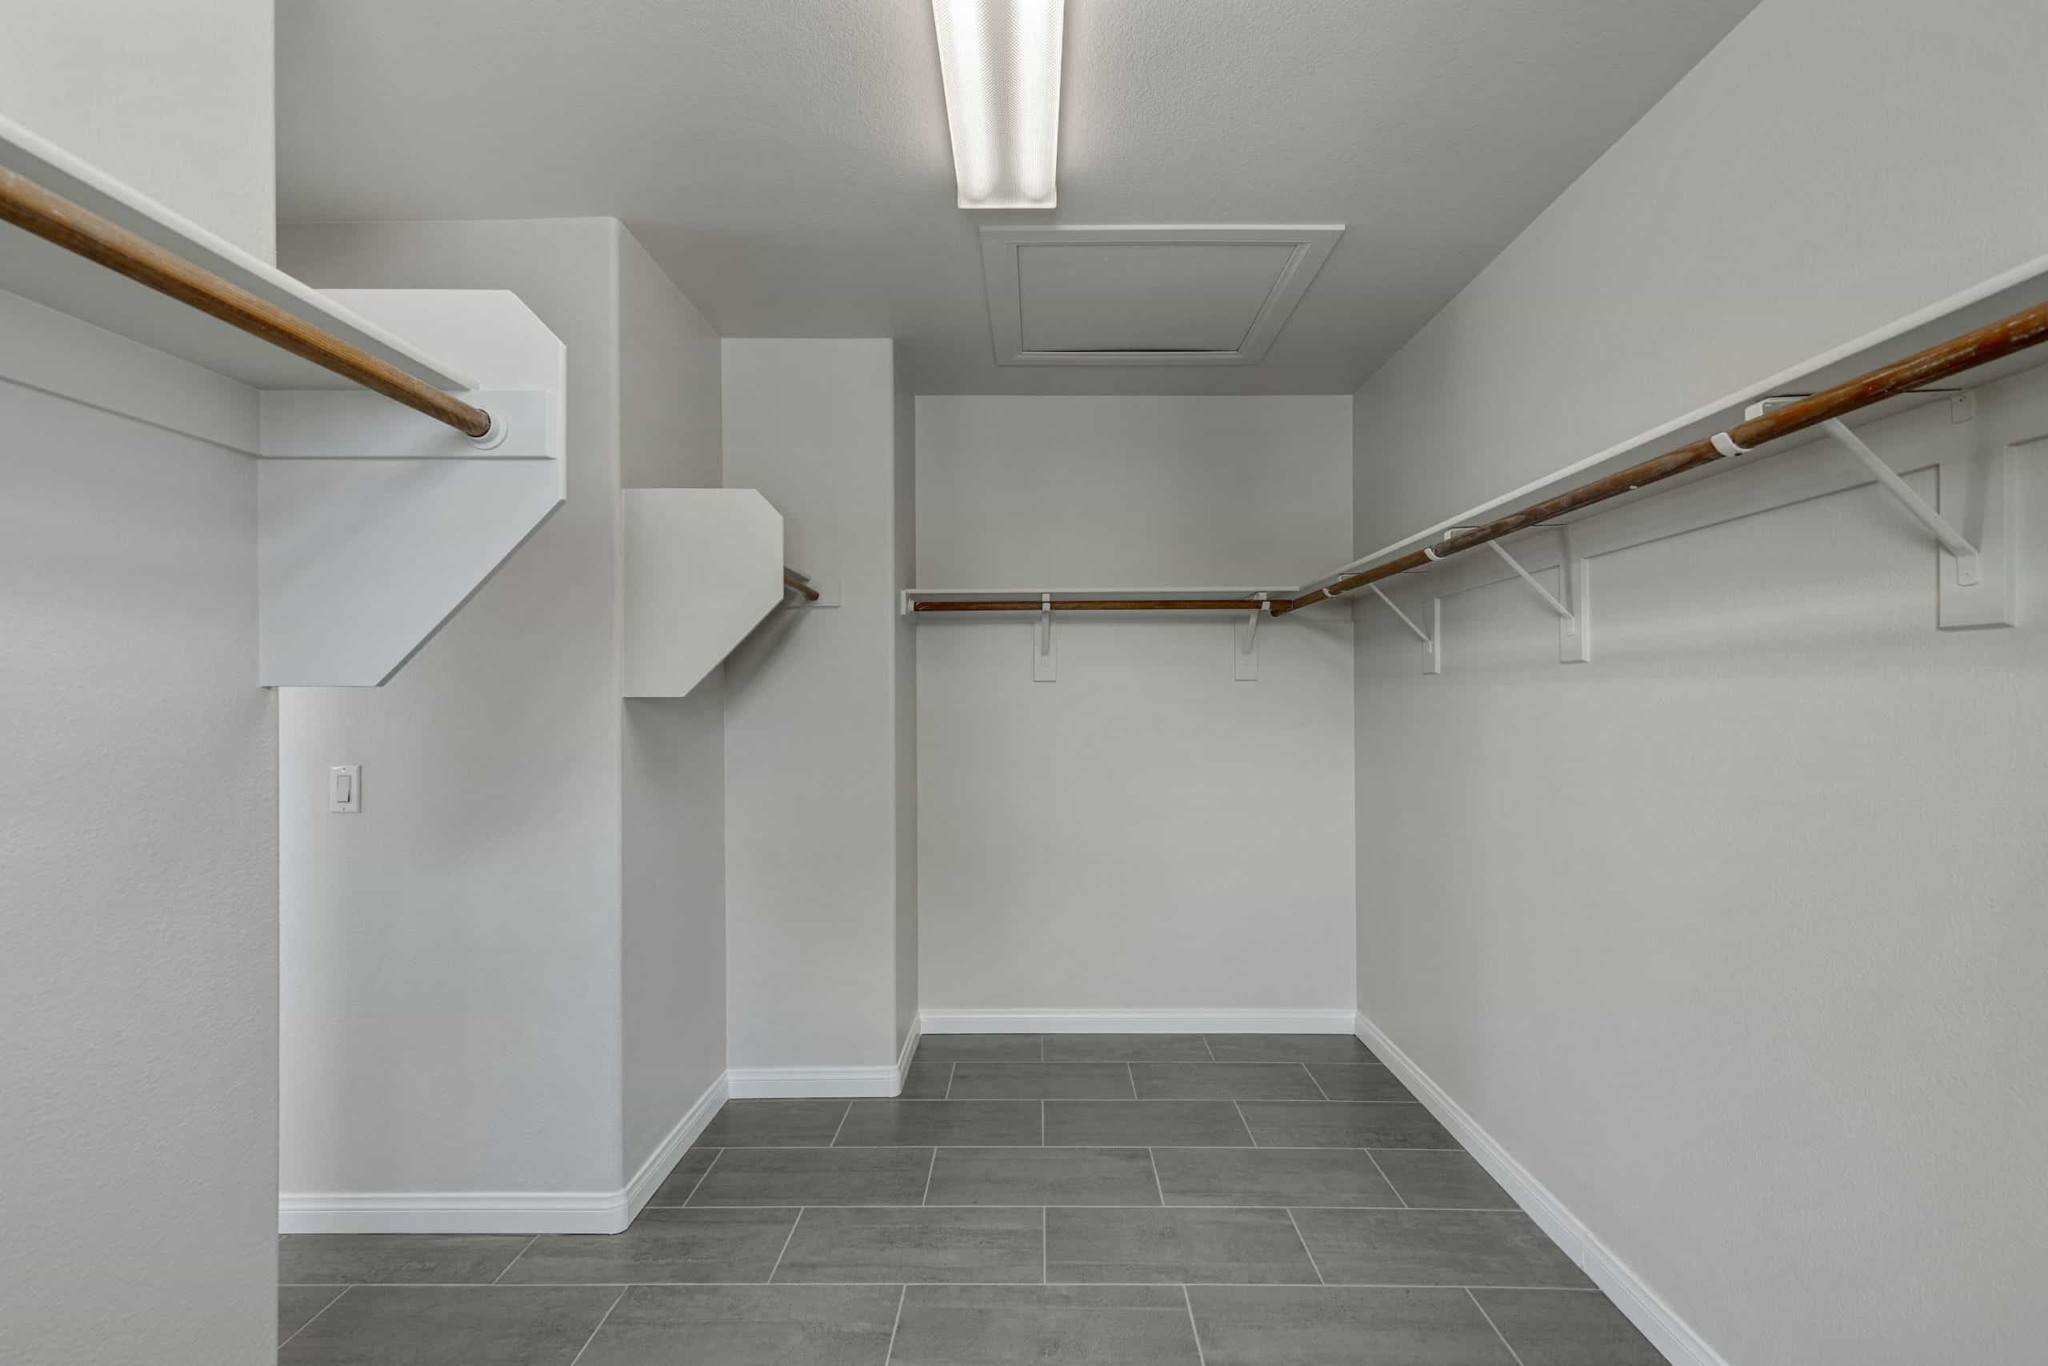 las-vegas-luxry-real-estate-realtor-rob-jensen-company-10491-haywood-drive-summerlin48